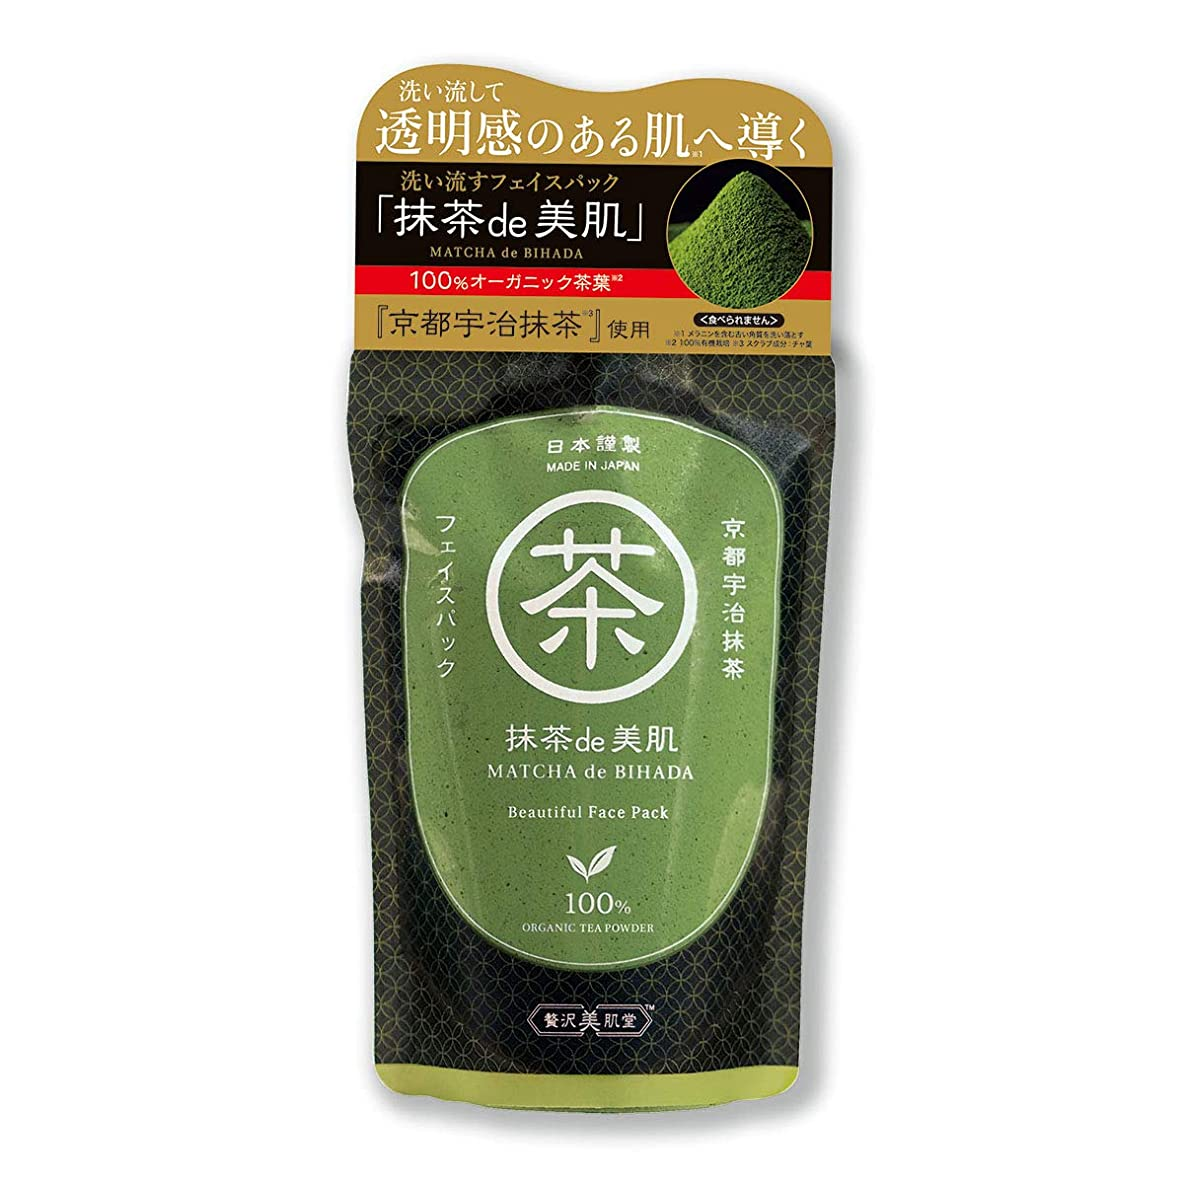 食品真夜中野菜贅沢美肌堂 抹茶de美肌 抹茶ミルクの香り 170g